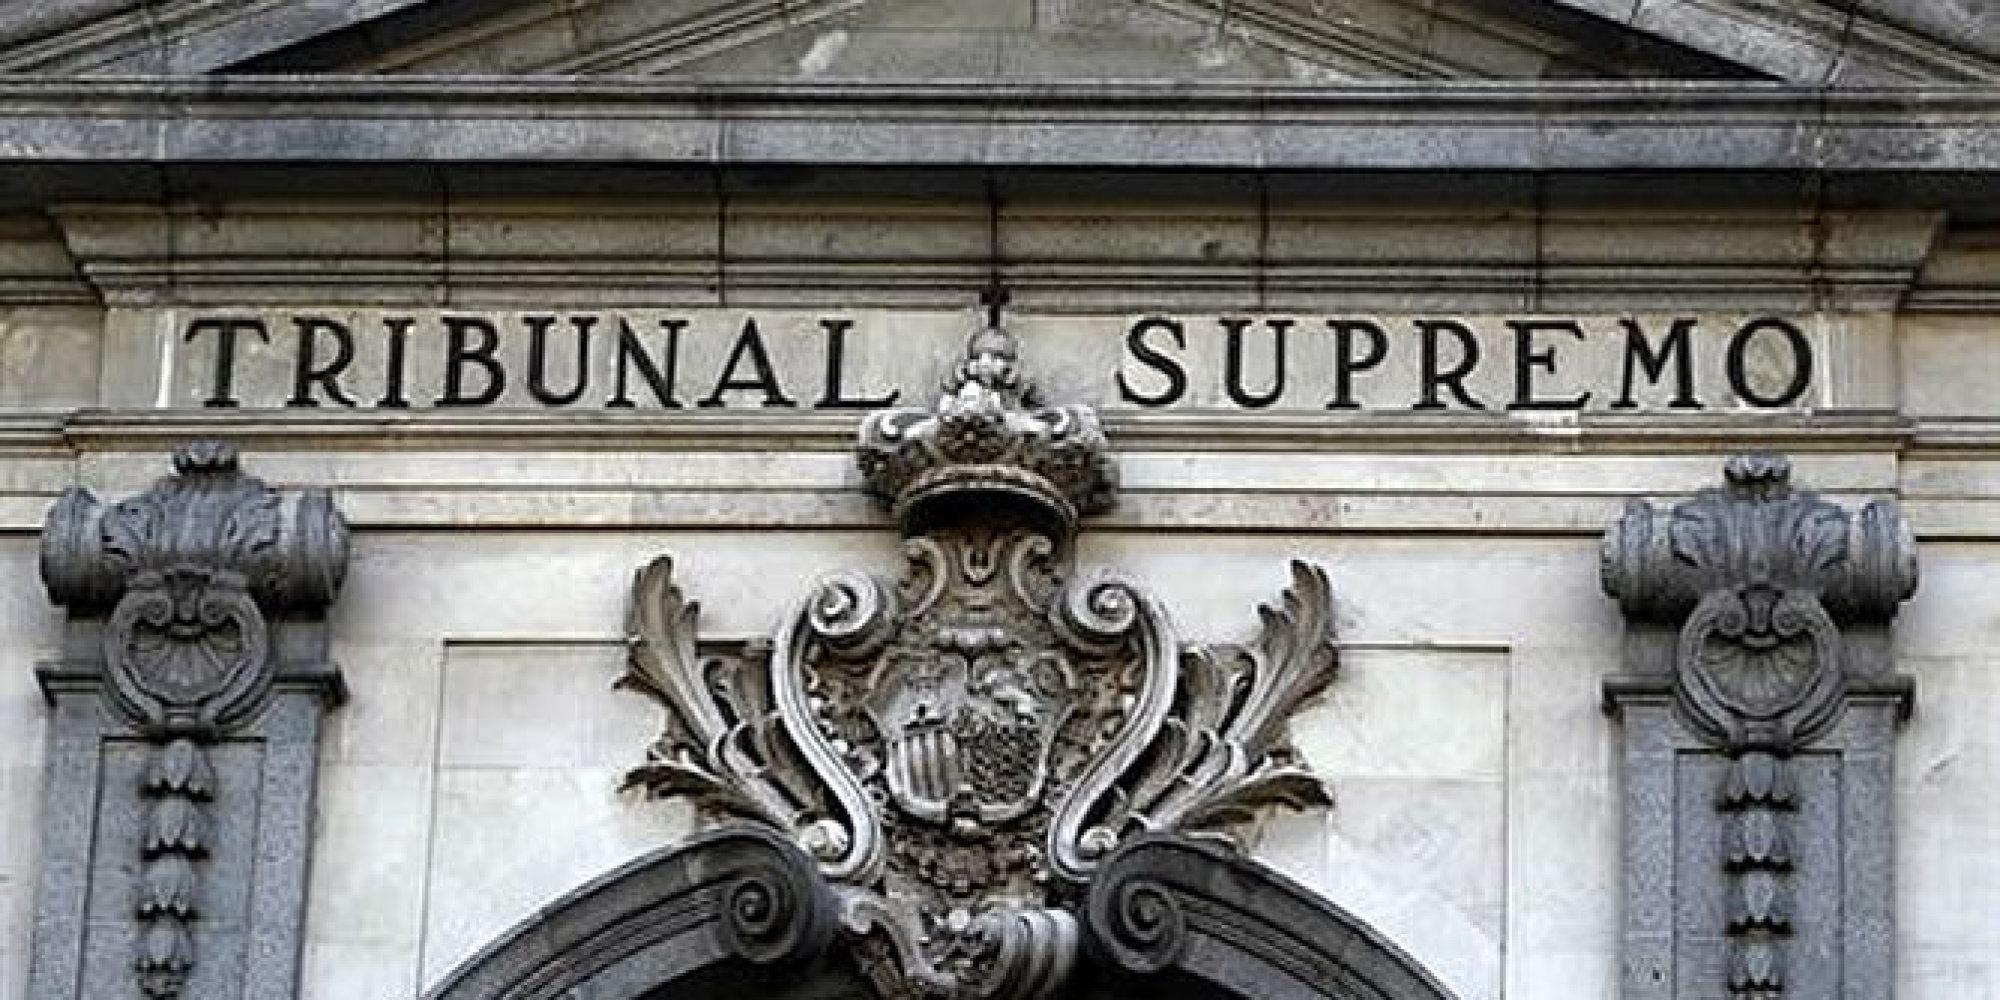 https://derechodelared.files.wordpress.com/2014/10/o-fachada-tribunal-supremo-facebook.jpg